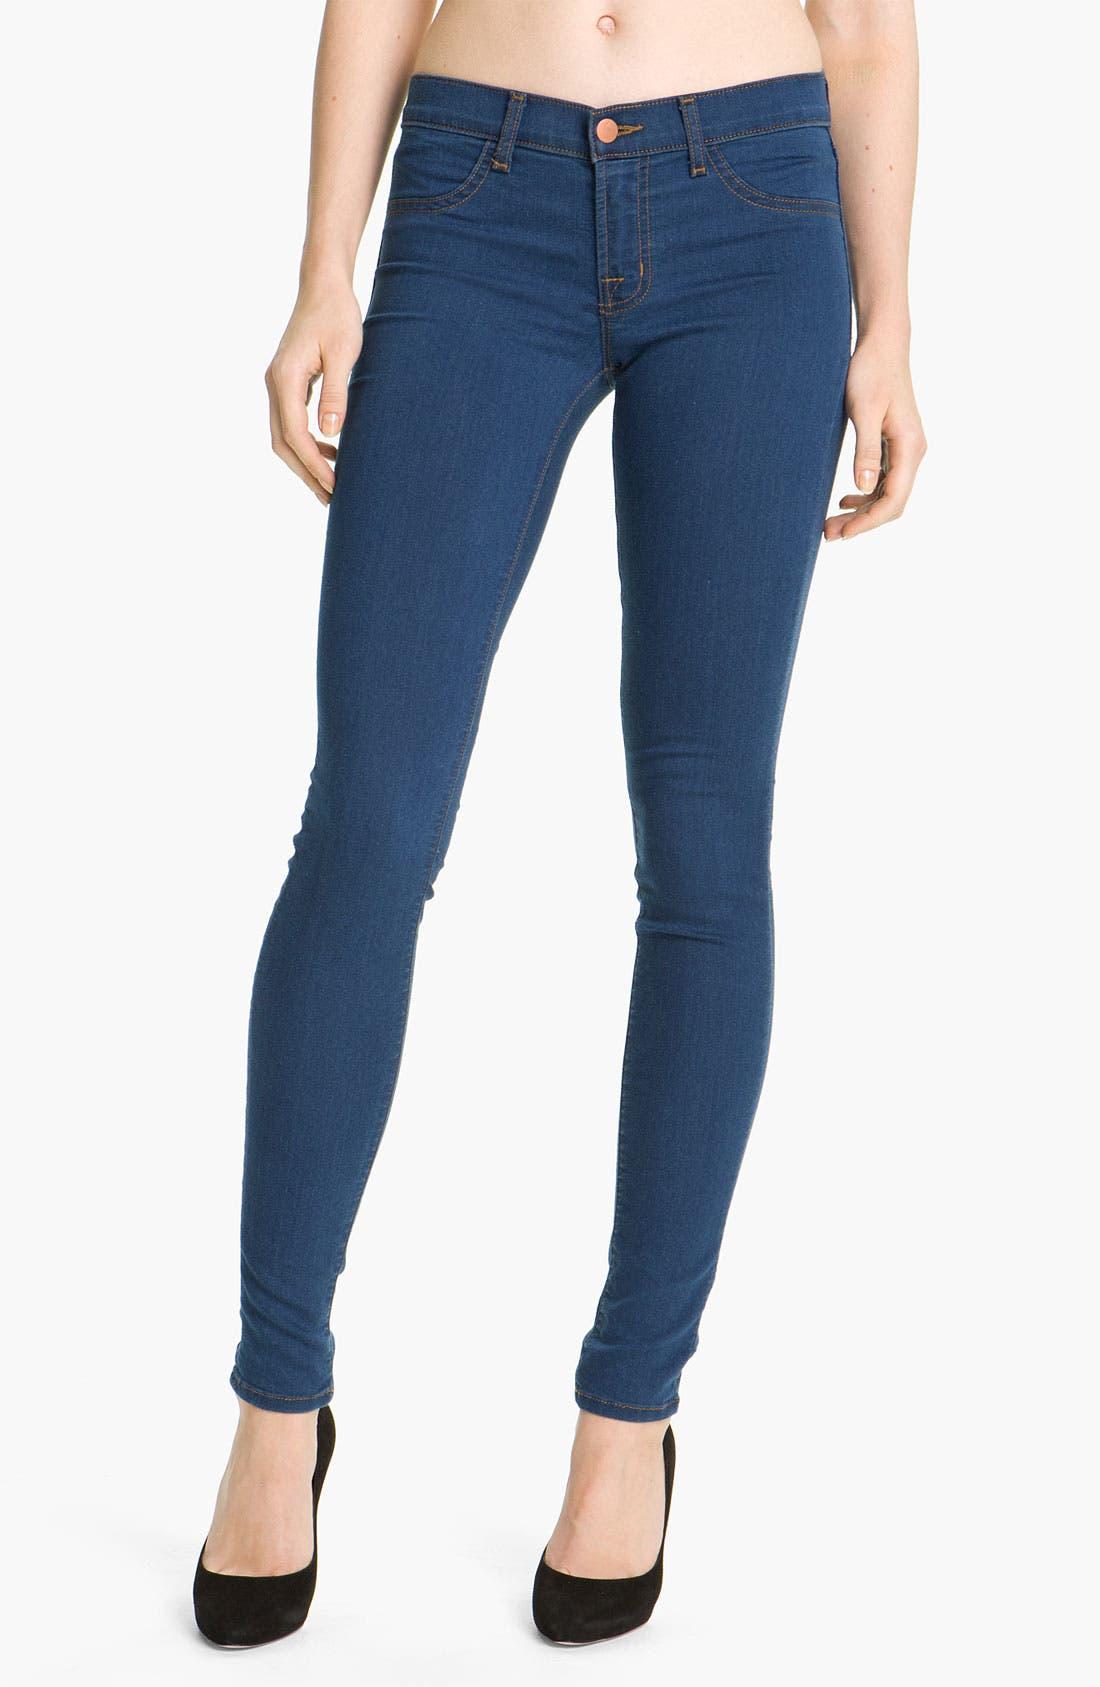 Main Image - J Brand 'Legging' Stretch Jeans (Salton)